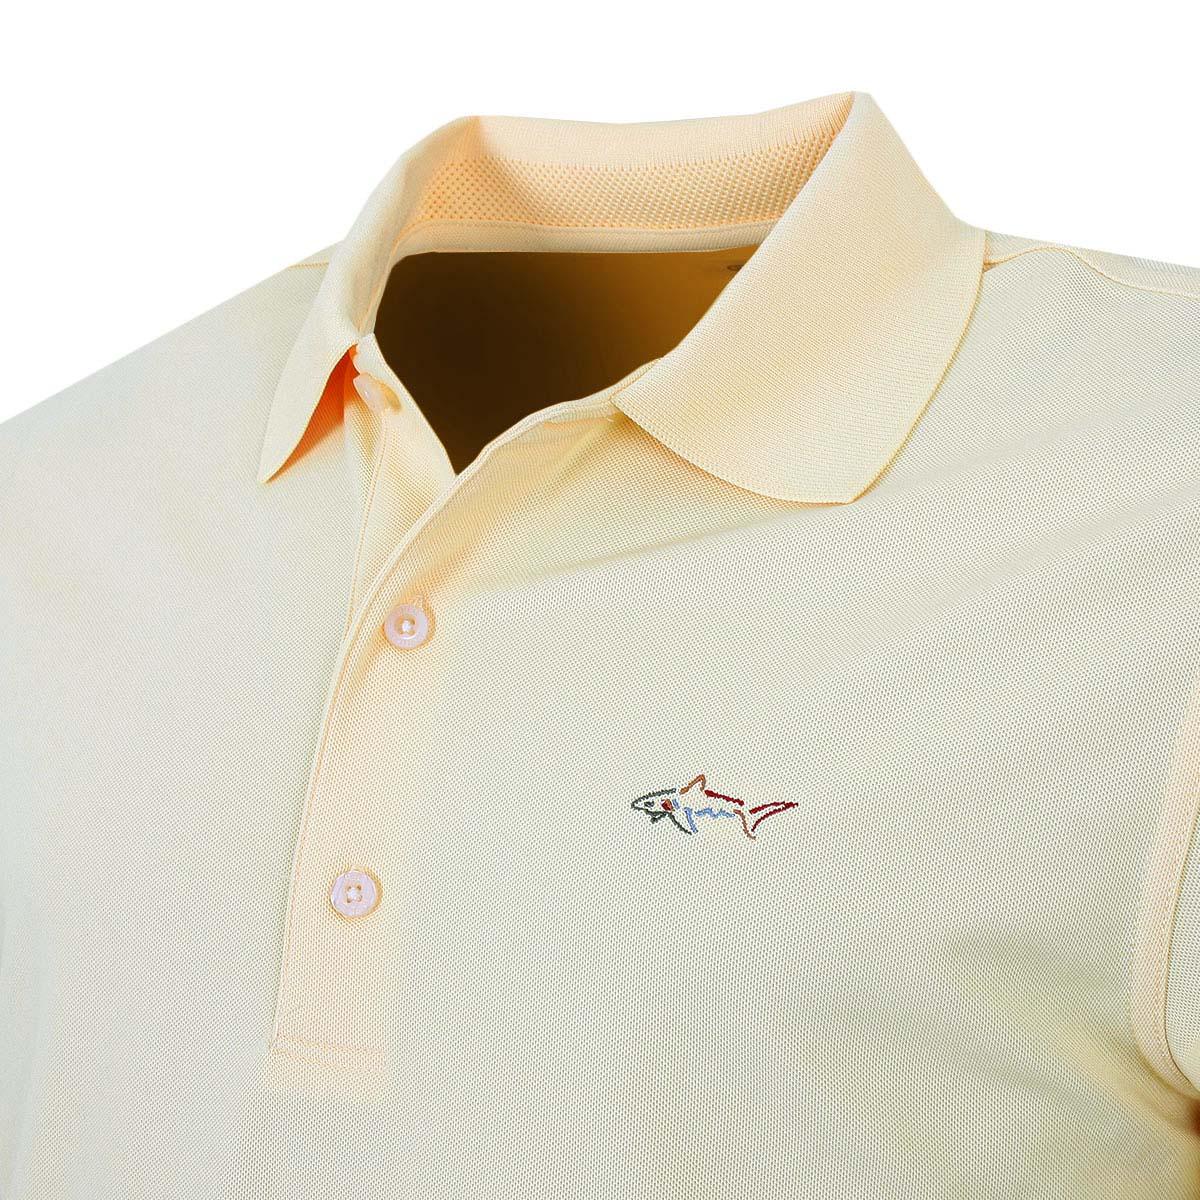 Greg-Norman-Mens-KX04-Performance-Micro-Pique-Golf-Polo-Shirt-28-OFF-RRP thumbnail 69